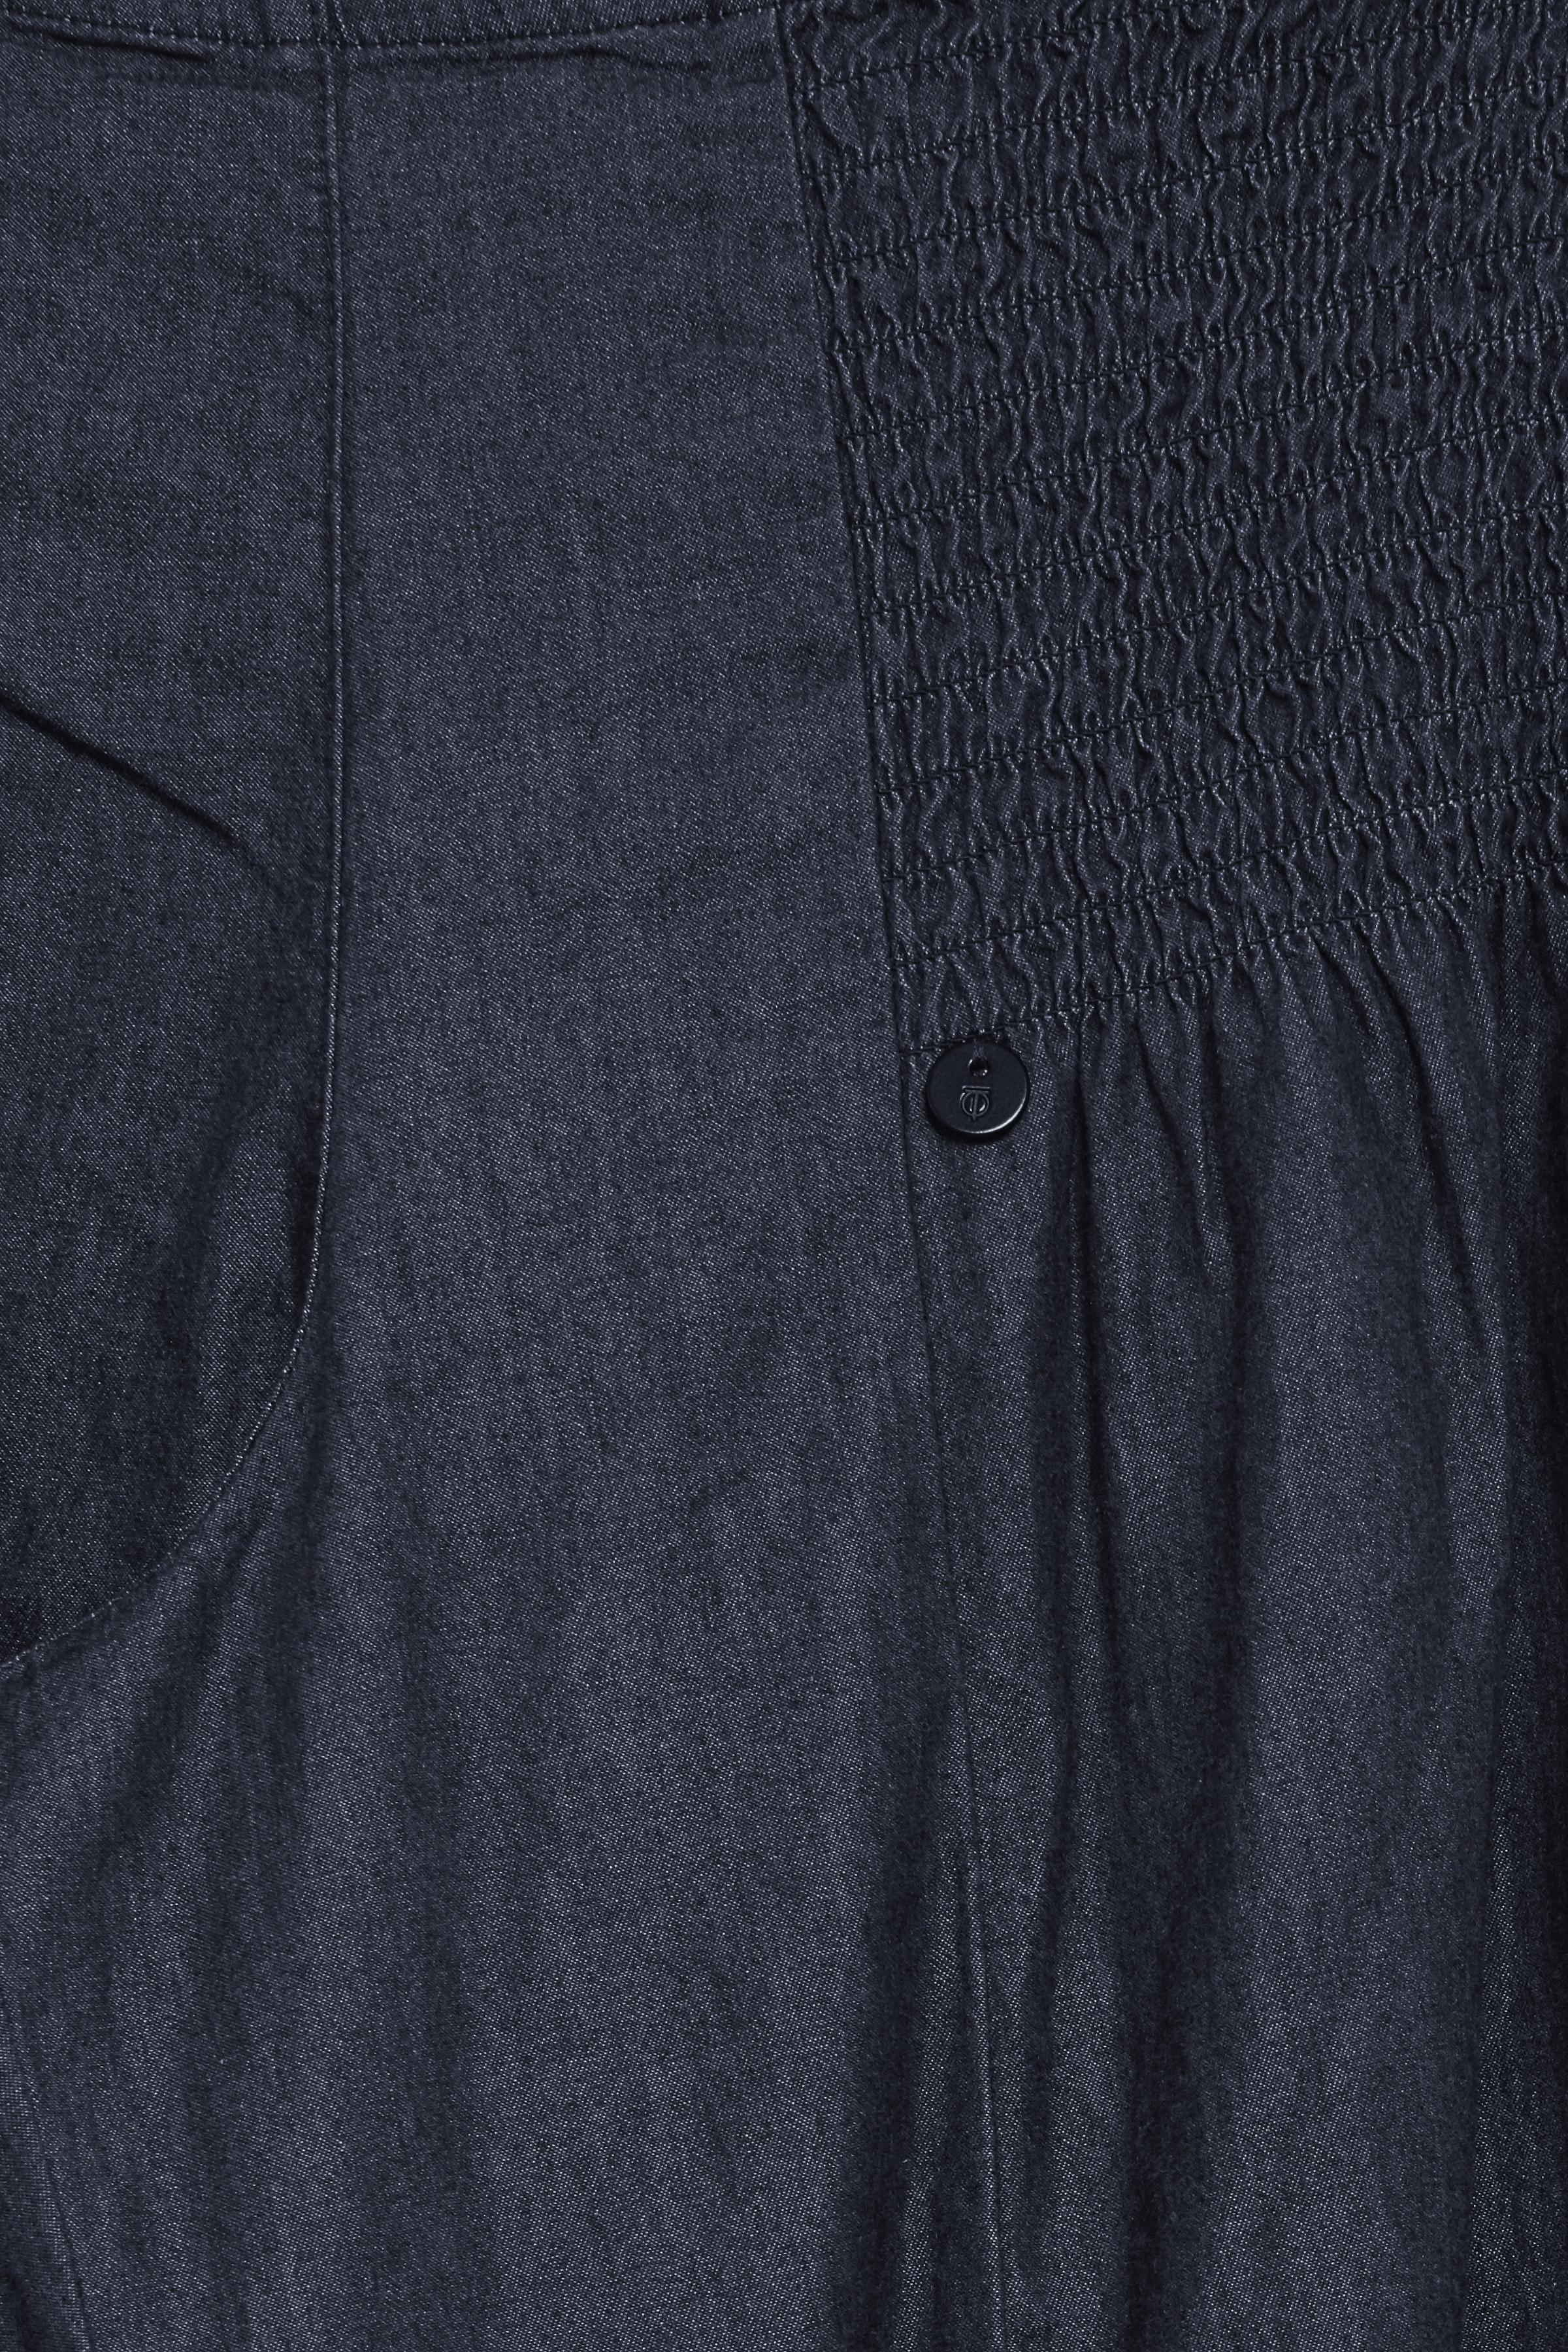 Mørk denimblå Casual bukser fra Pulz Jeans – Køb Mørk denimblå Casual bukser fra str. XS-XXL her